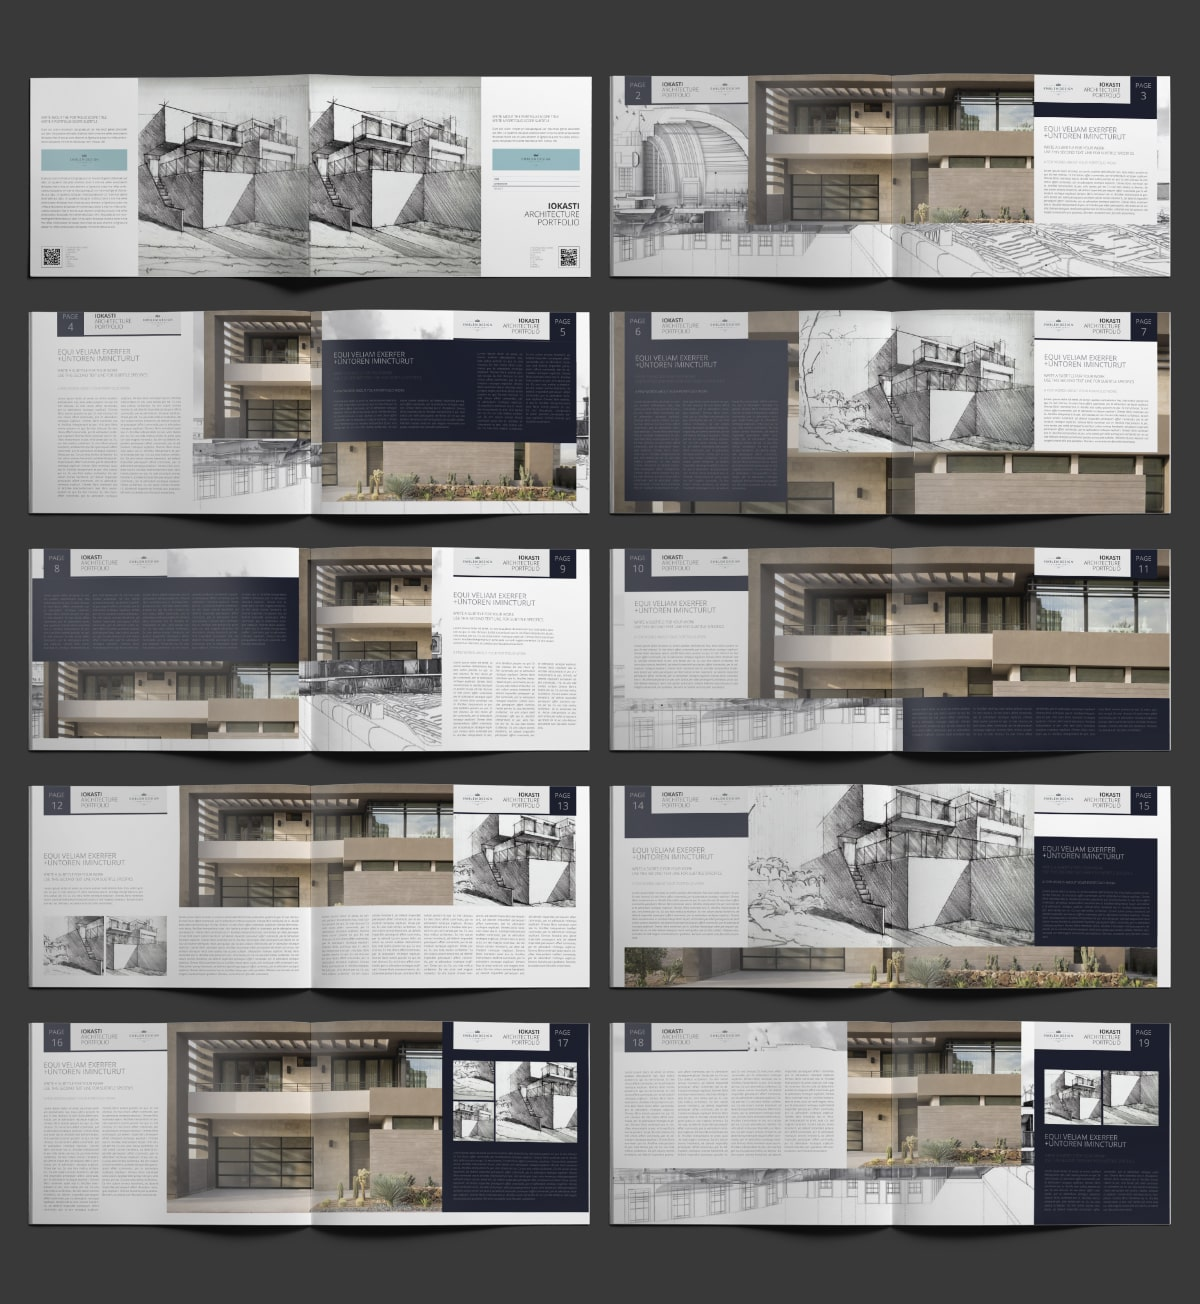 Iokasti Architecture Portfolio A4 Landscape - Layouts